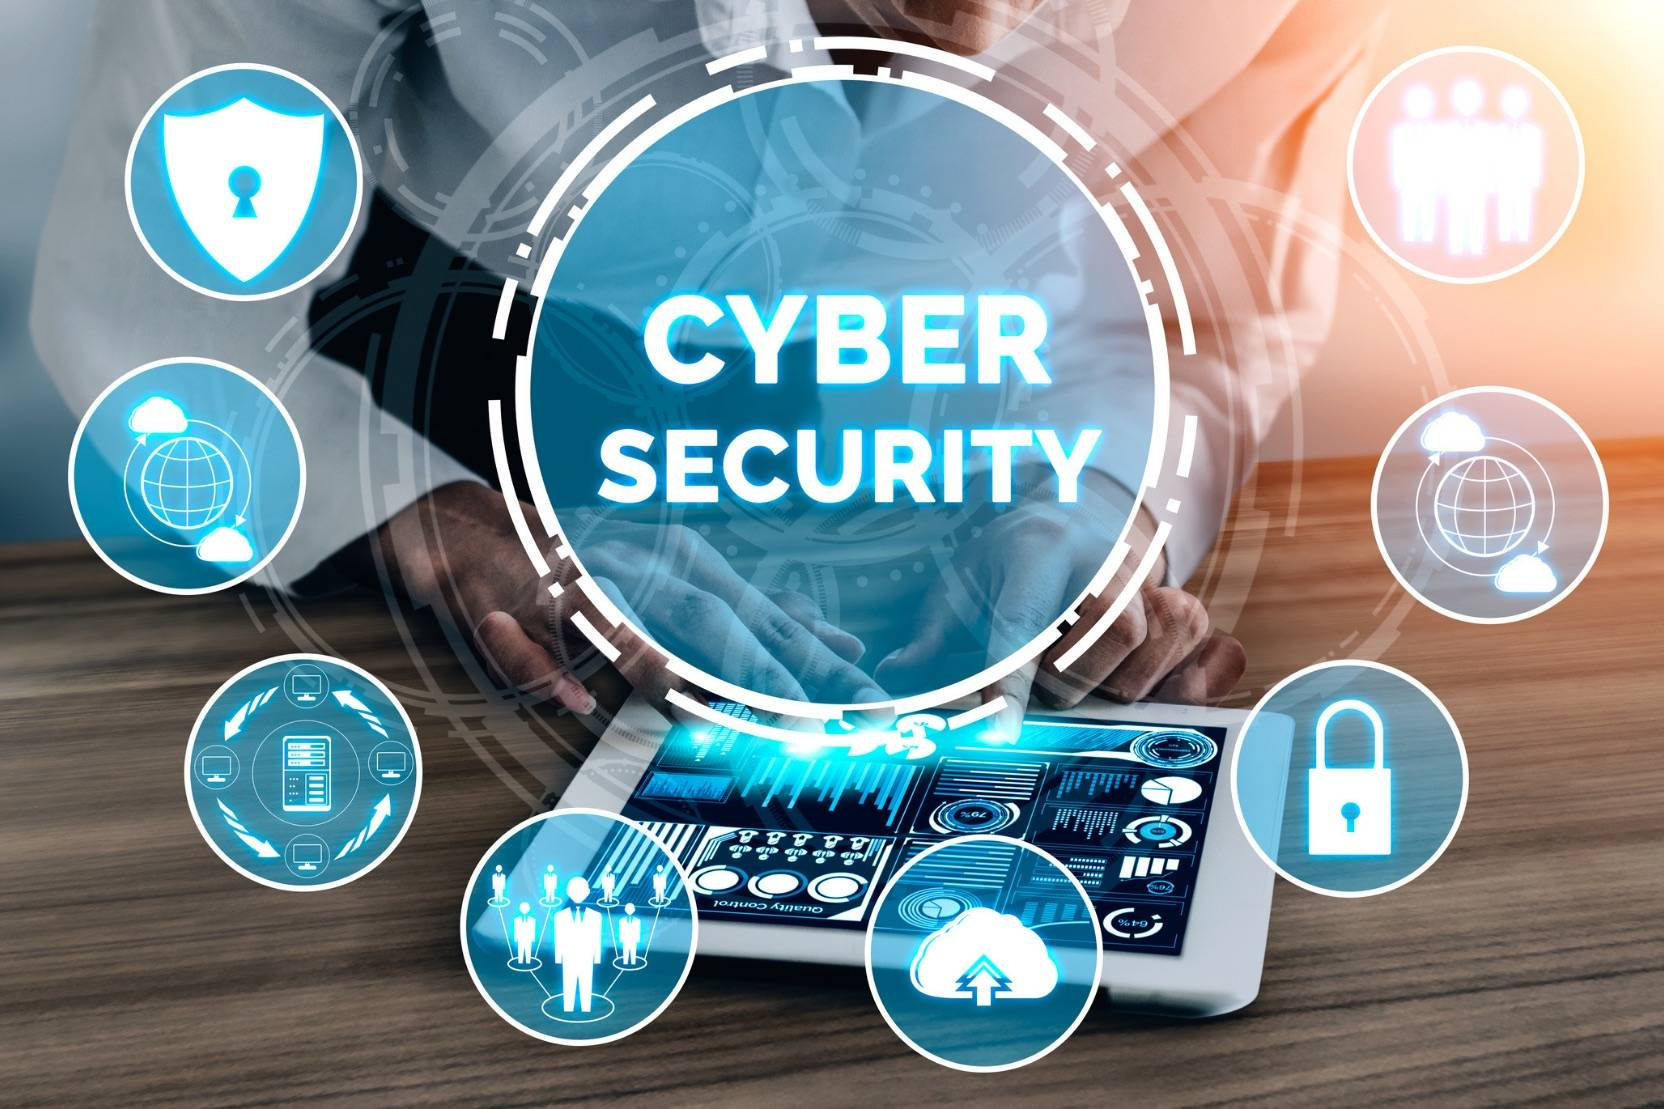 Cyberkriminalität Cyber Security